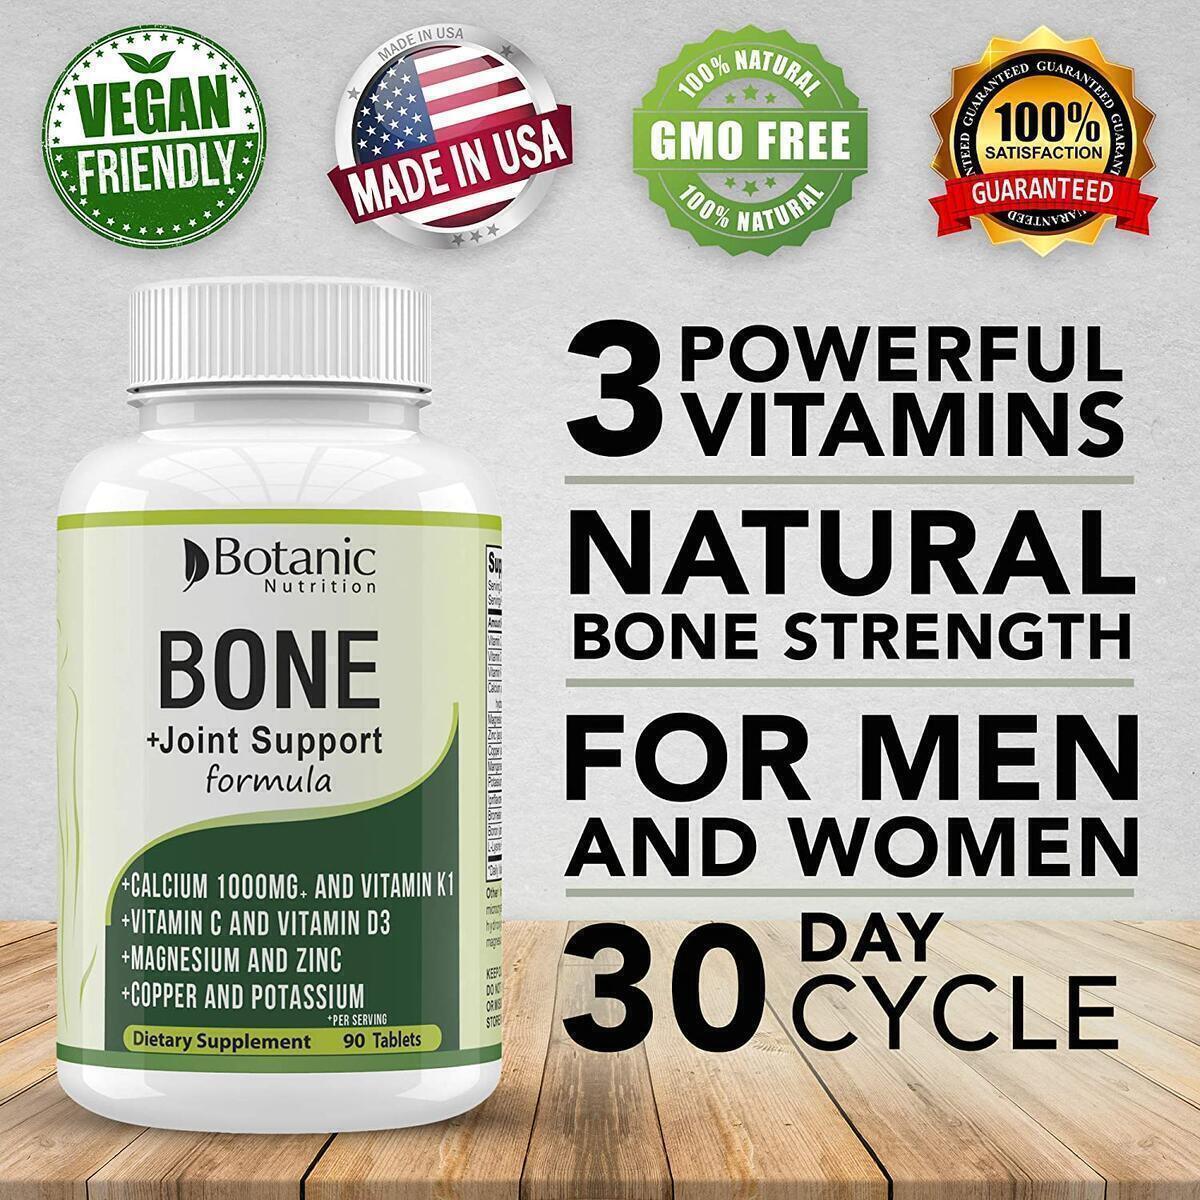 Bone Strength 1000mg Calcium Magnesium Potassium Supplement with Vitamin C, D3, K1 - Bone Vitamin for Men & Women - Best for Bone Support, Bone Growth and for Bone Health - 90 Vegetarian Tablets